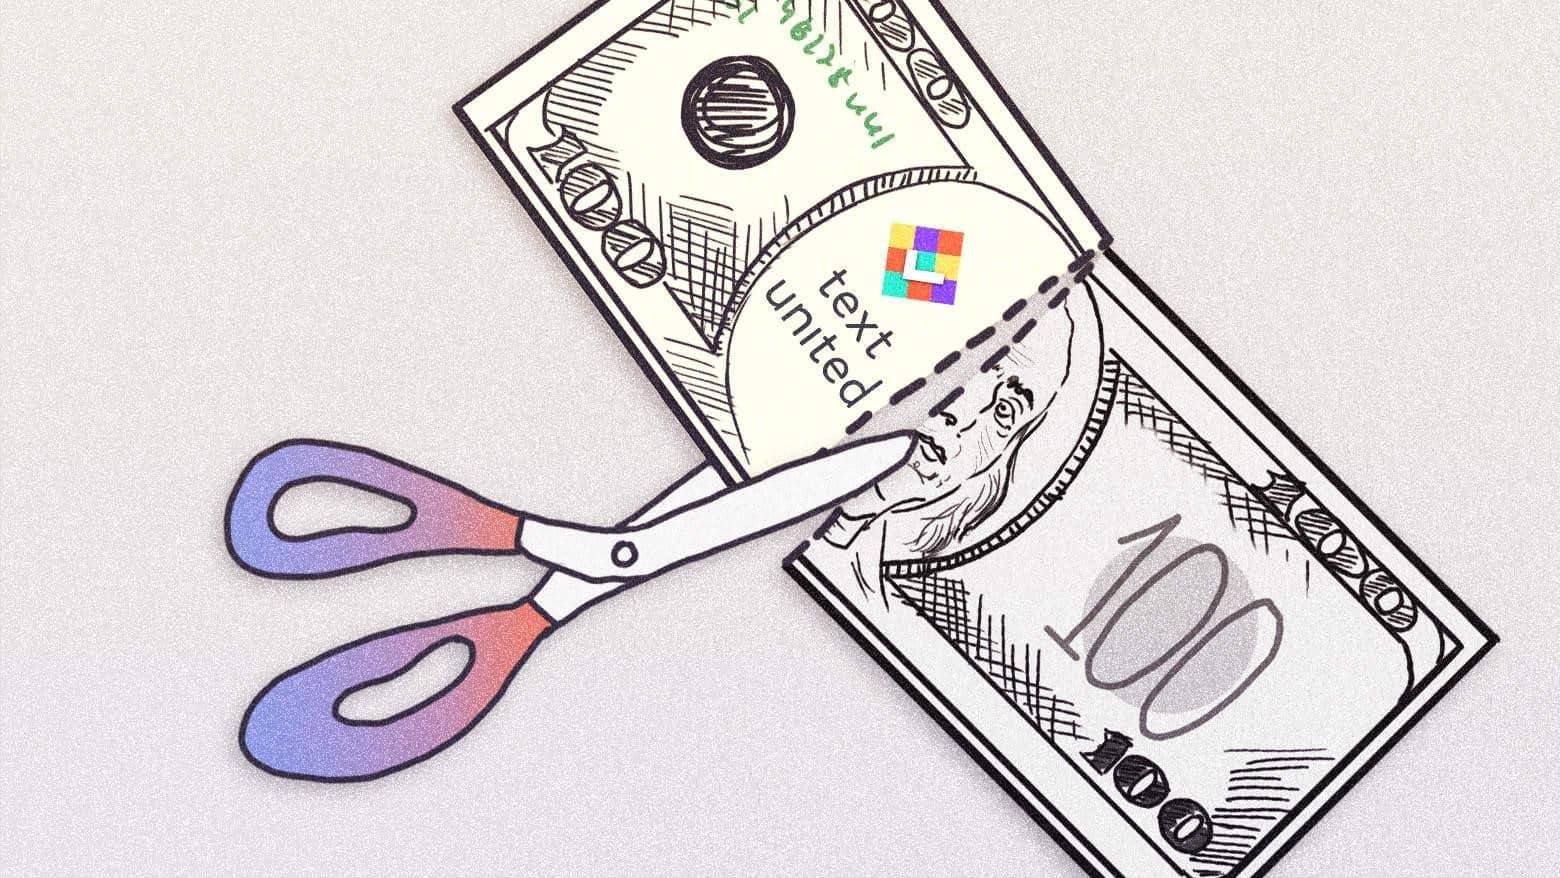 10 Ways to Cut Website Translation Costs